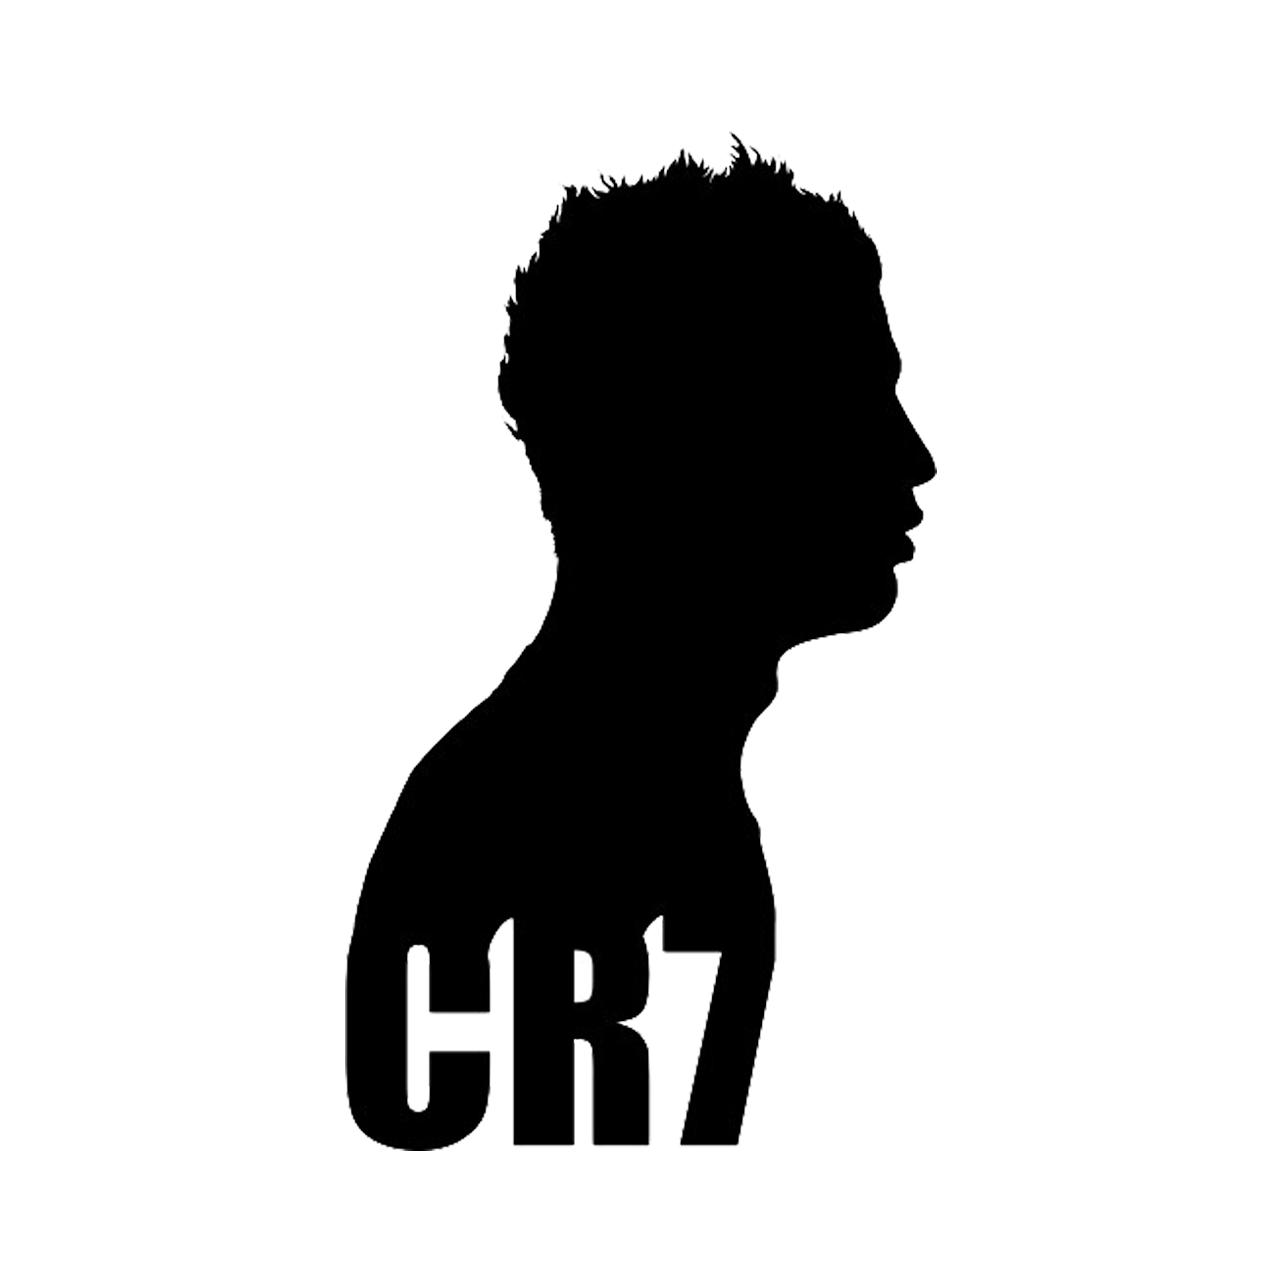 استیکر طرح کریس رونالدو کد STP1179